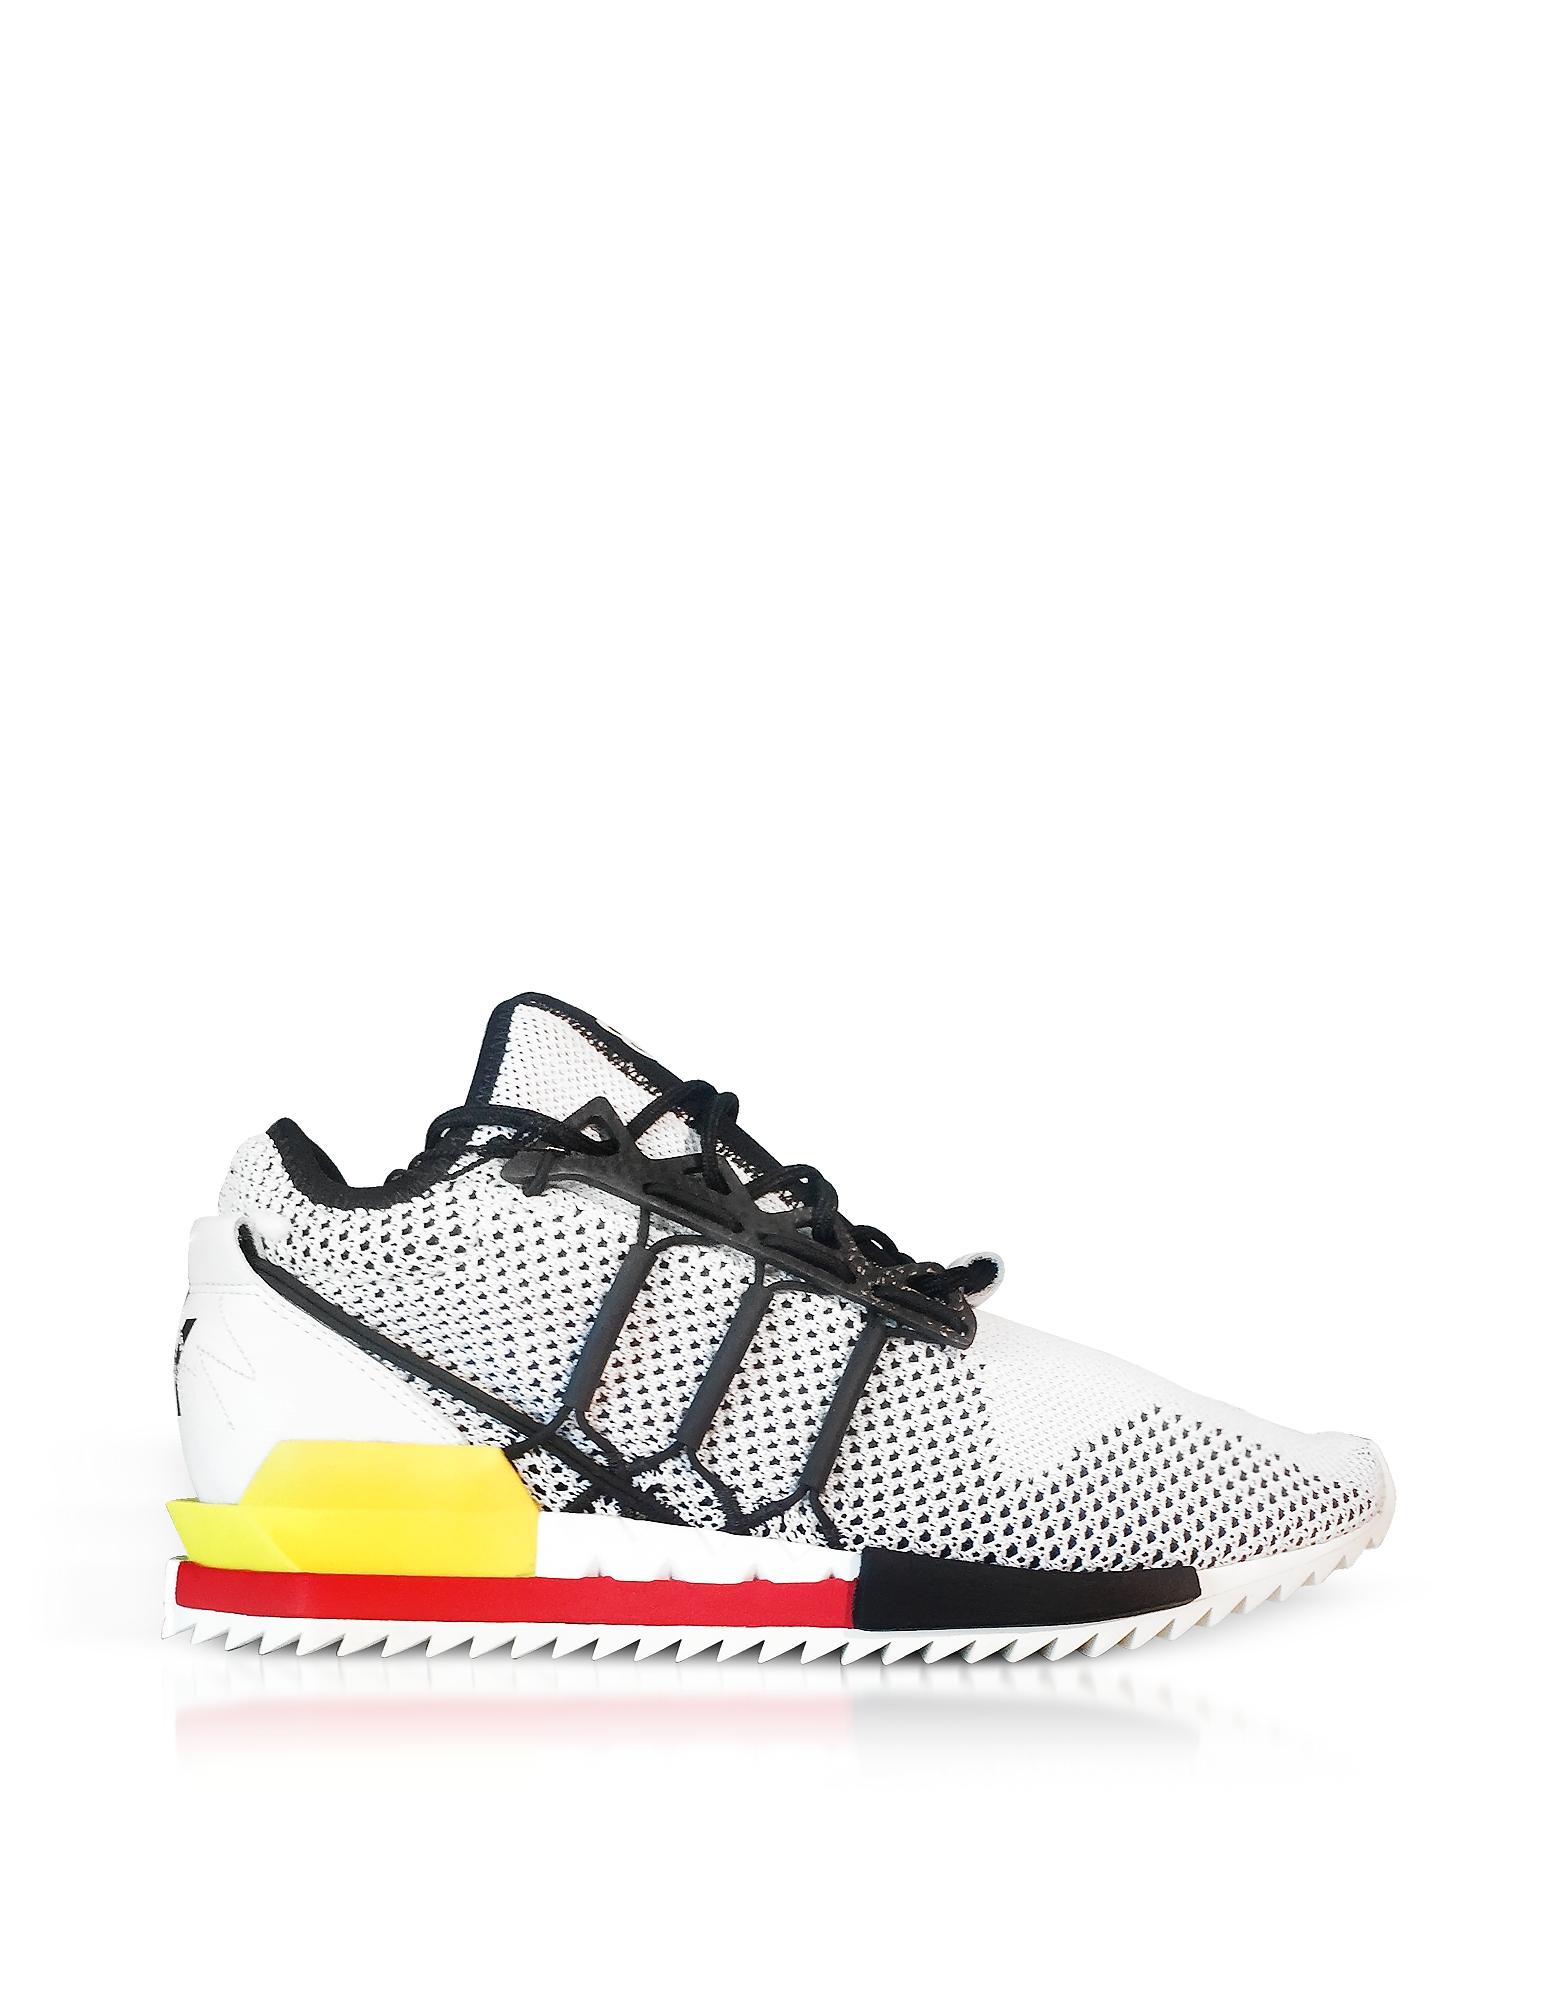 Y-3 Shoes, Y-3 Harigane Nylon Men's Sneakers